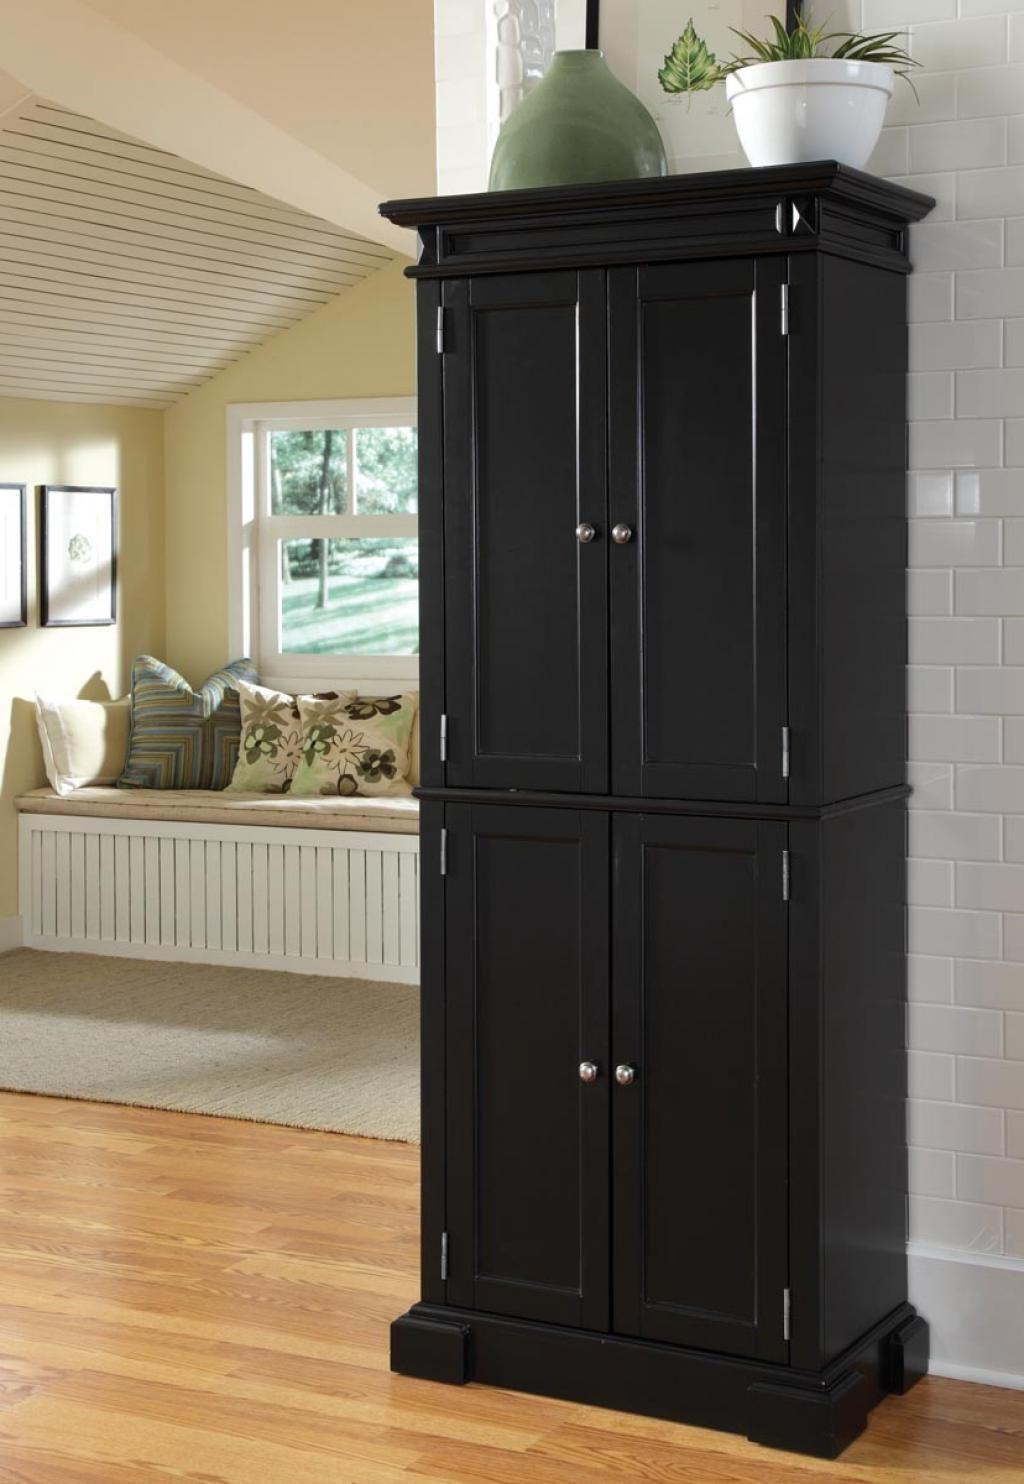 kitchen pantry ideas baytownkitchen storage with